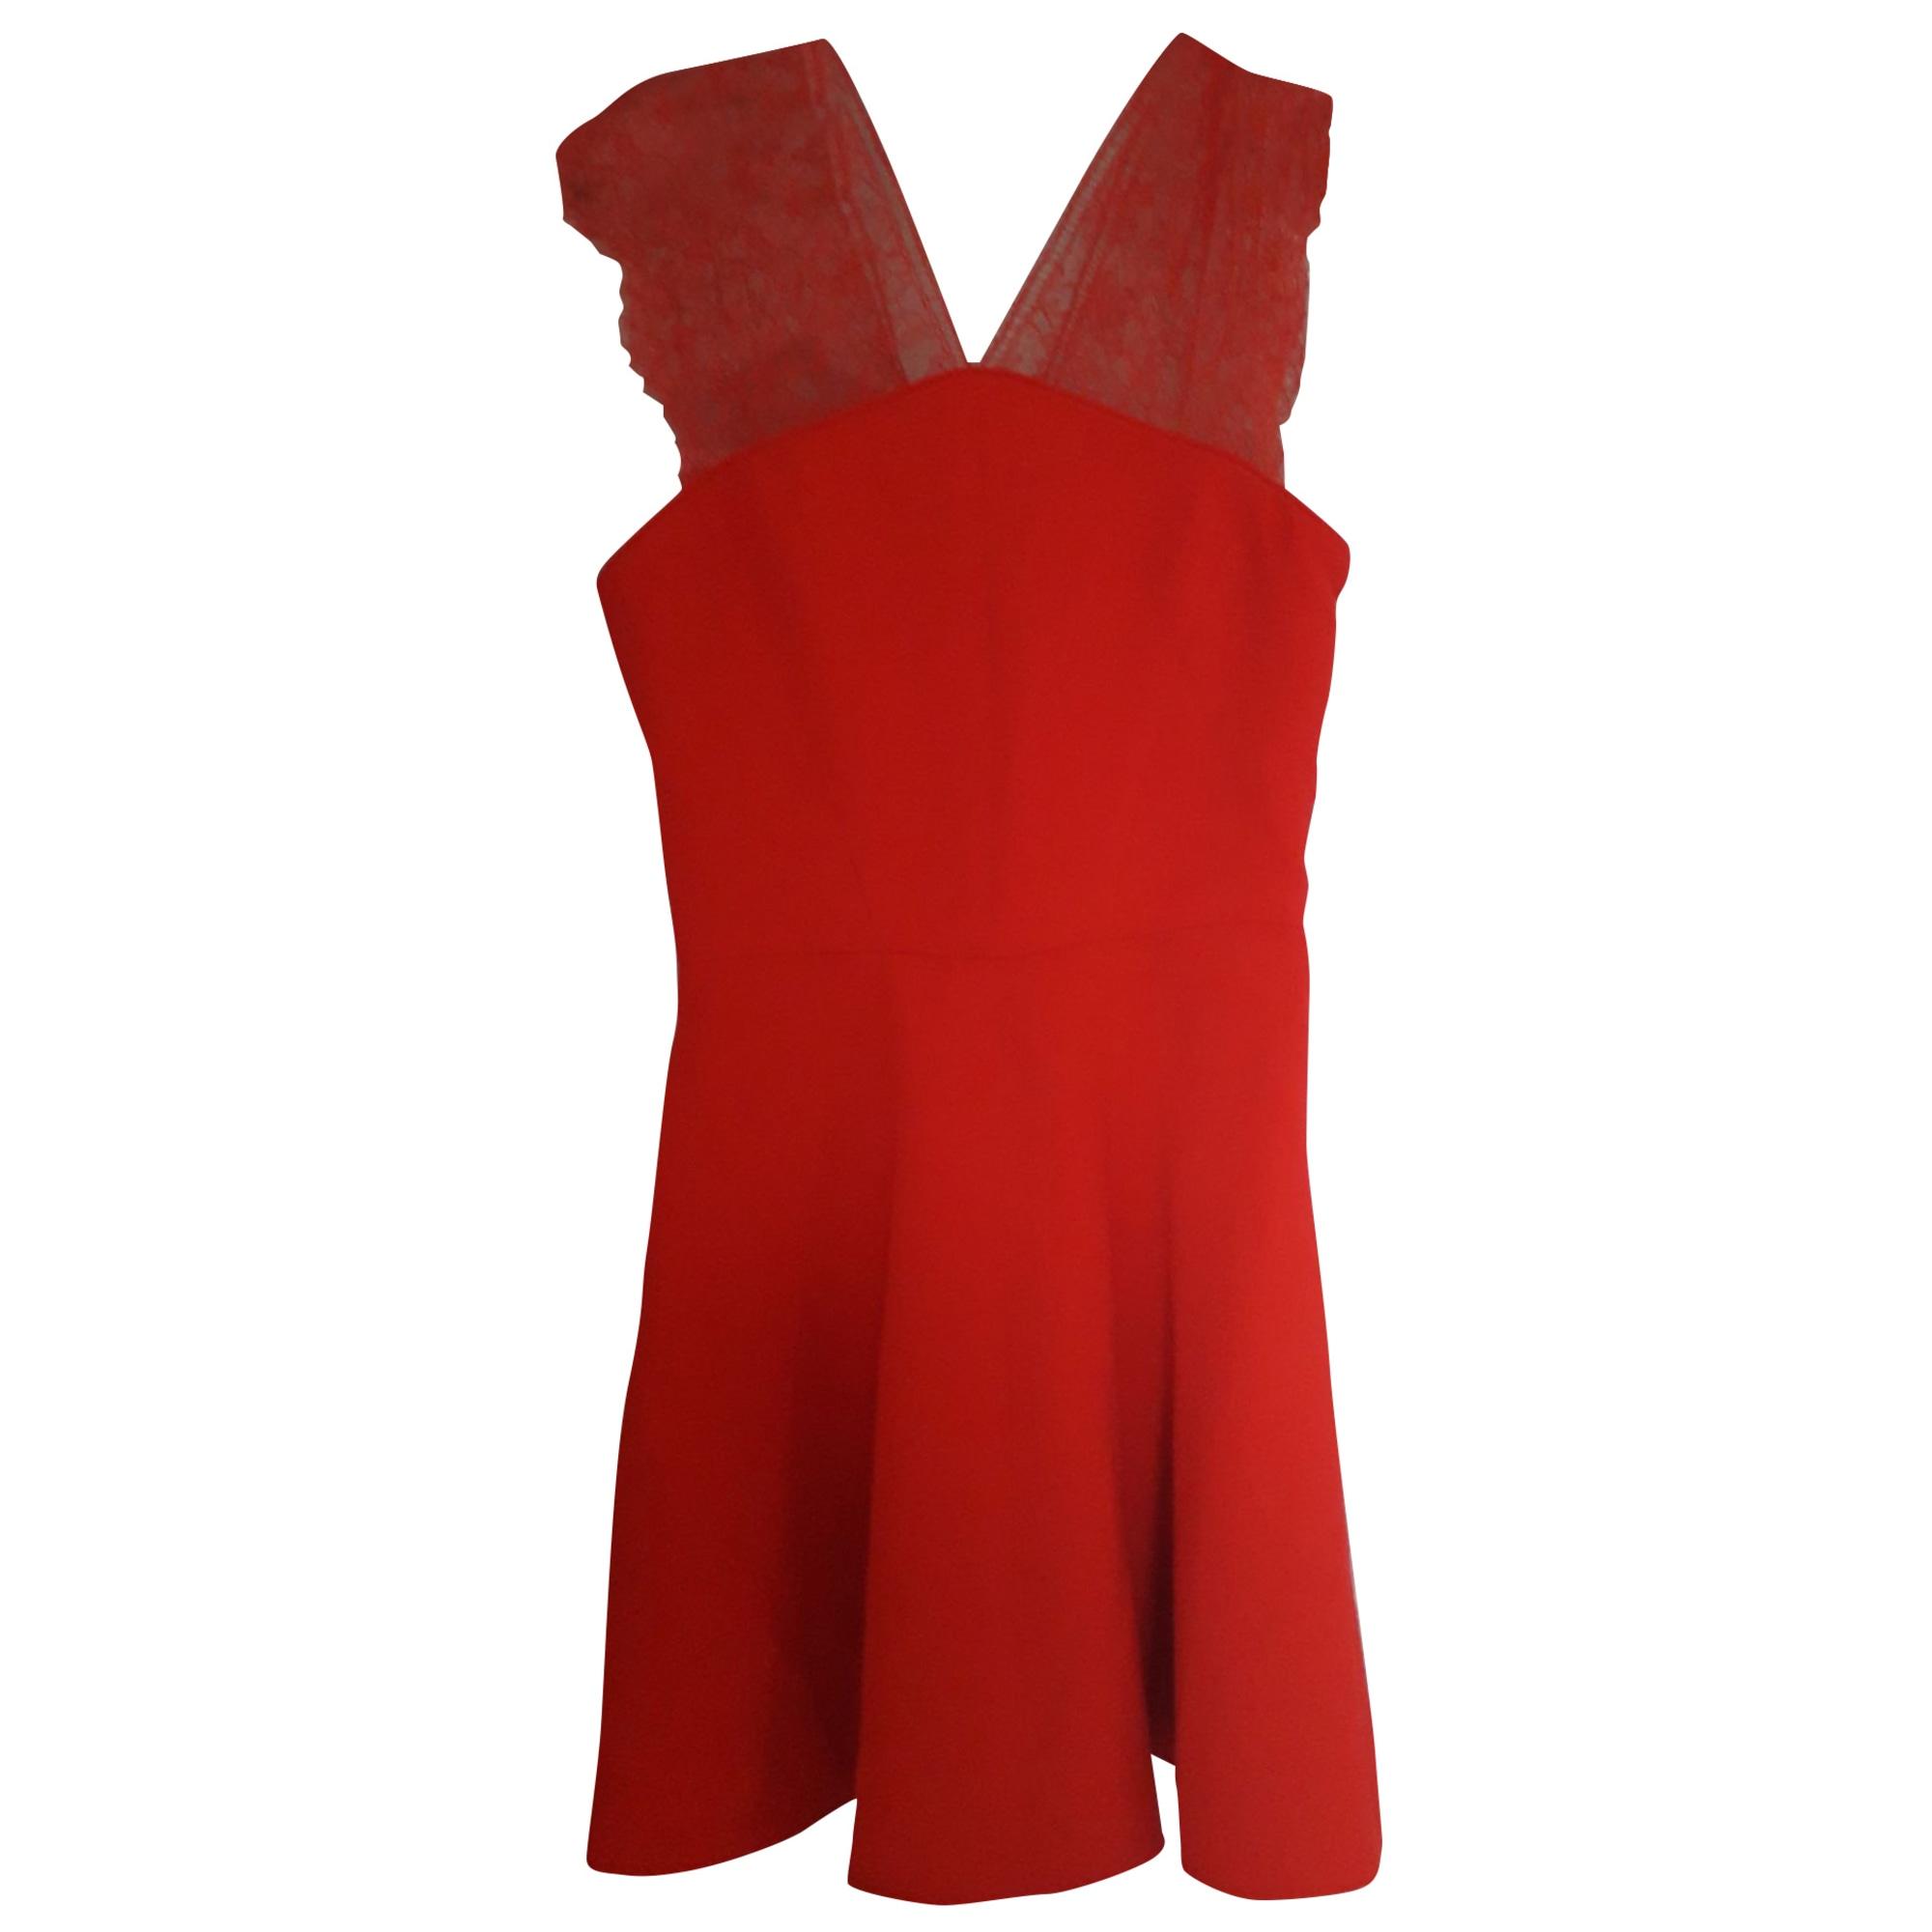 Robe courte THE KOOPLES Rouge, bordeaux